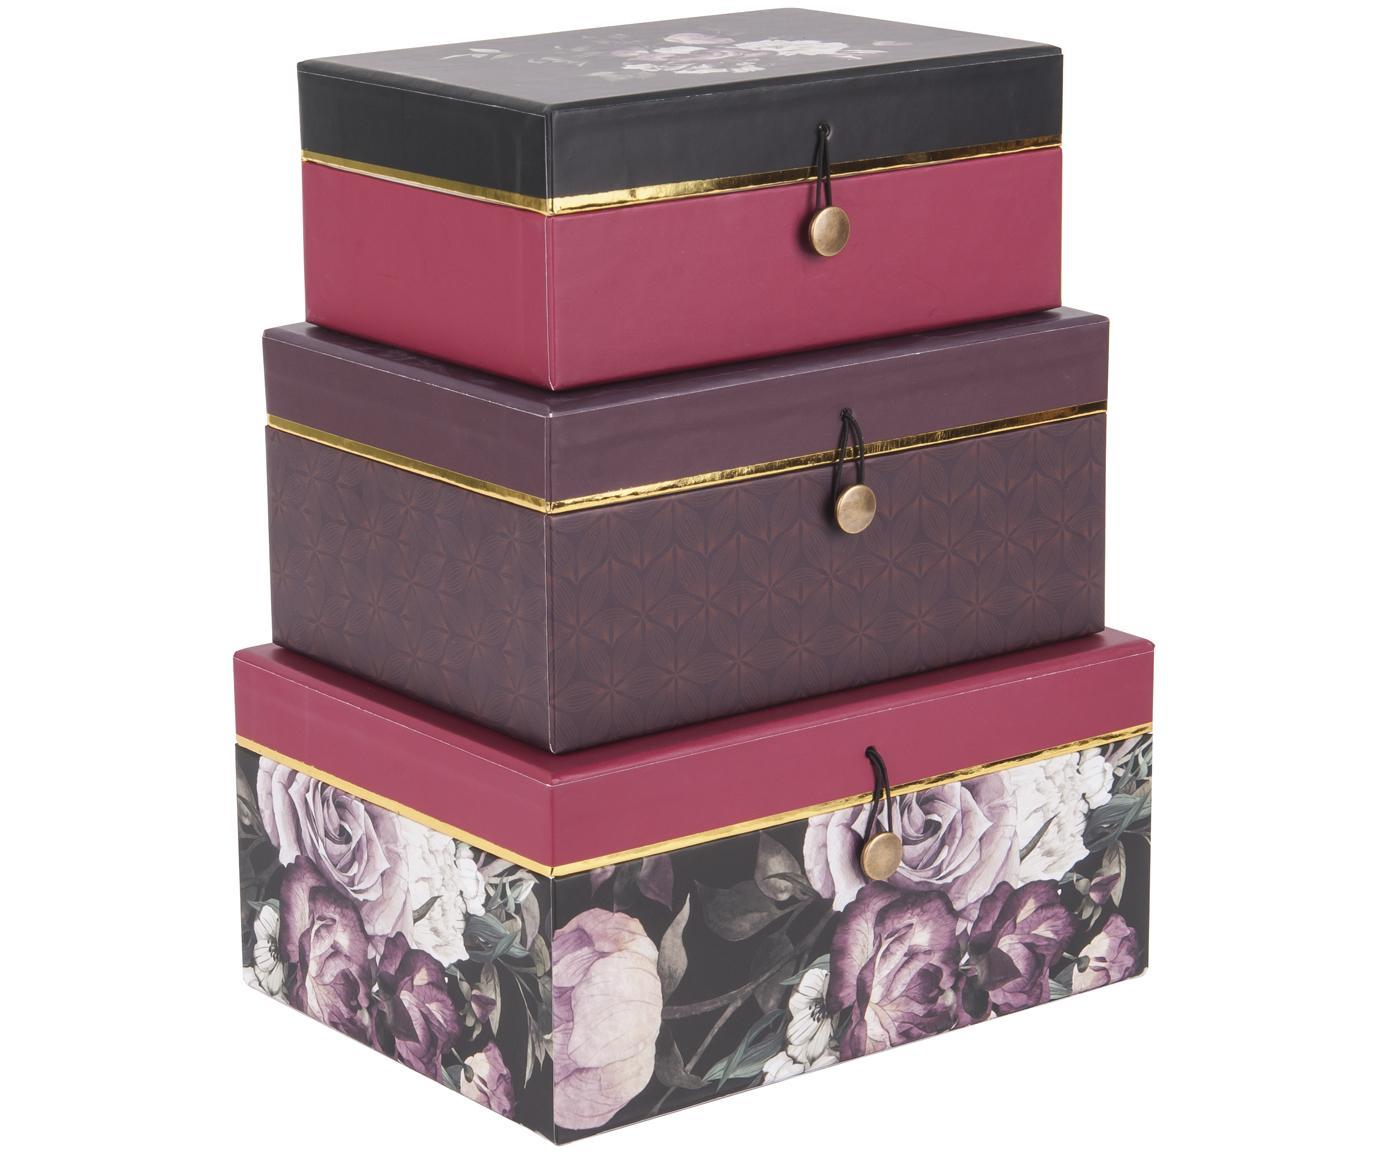 Set de cajas para regalo Flores, 3pzas., Papel, Lila, rosa, Tamaños diferentes